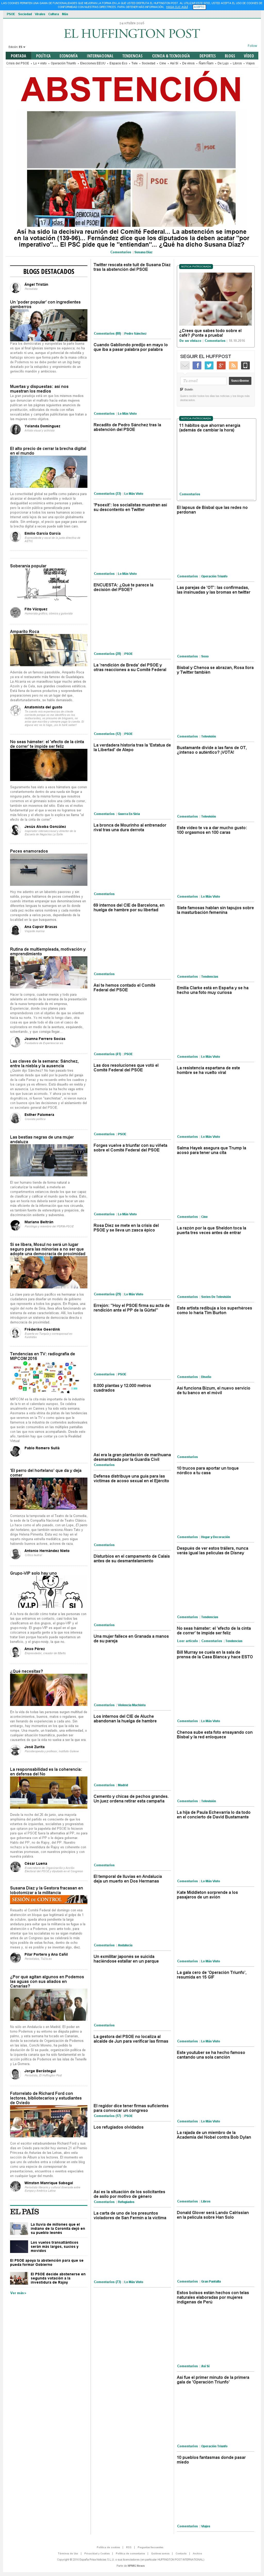 El Huffington Post (Spain) at Monday Oct. 24, 2016, 5:05 a.m. UTC